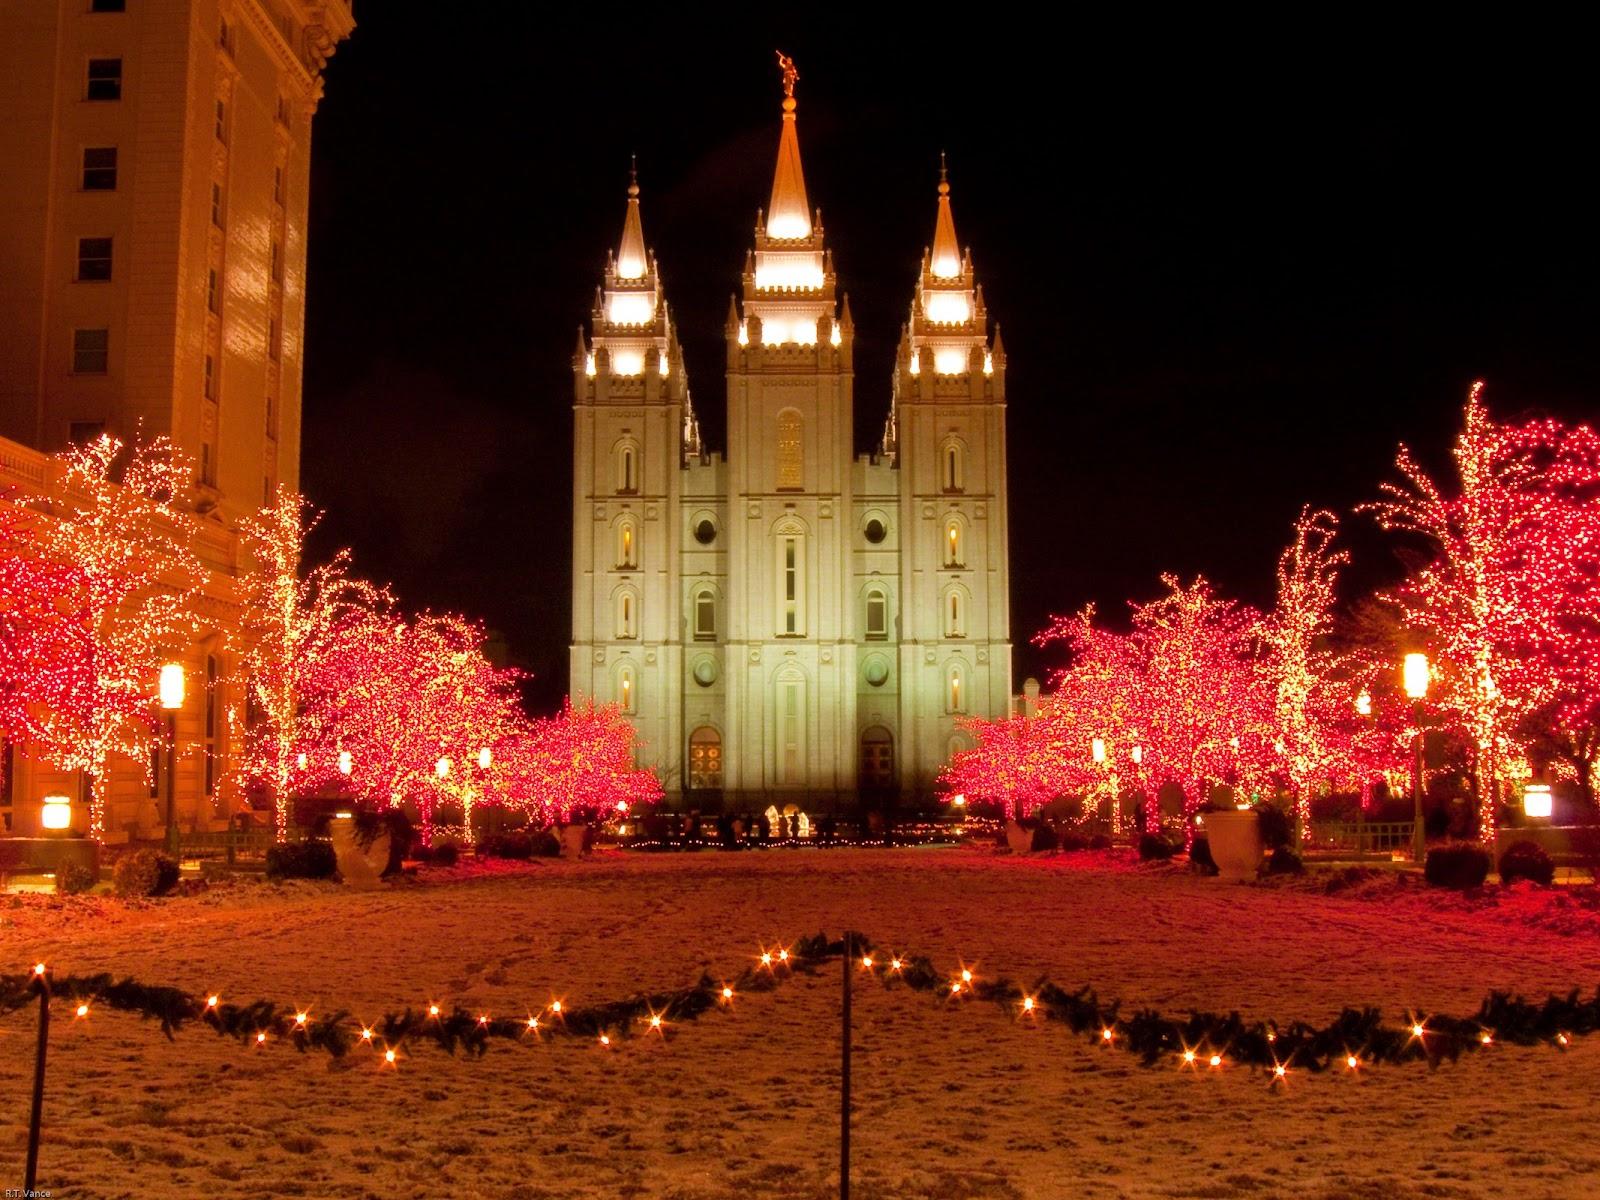 Christmas lights on trees in Salt Lake City, Utah